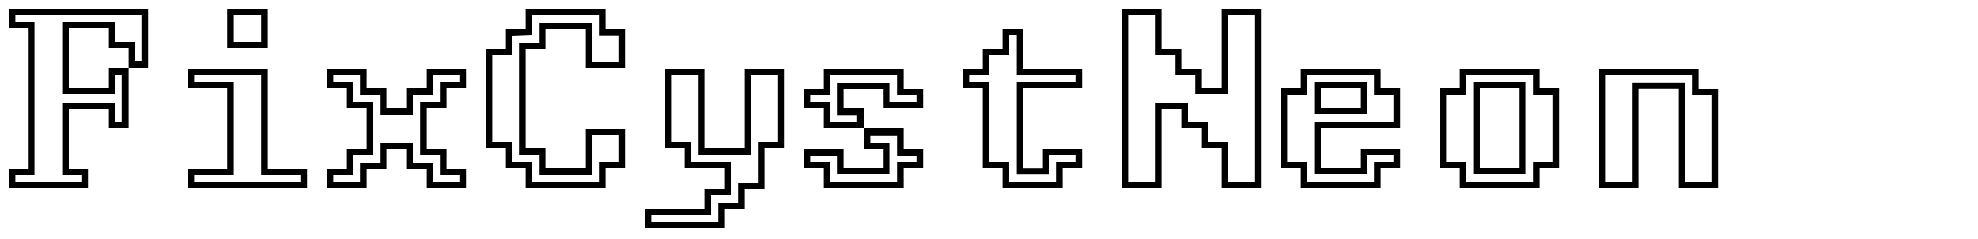 FixCystNeon font